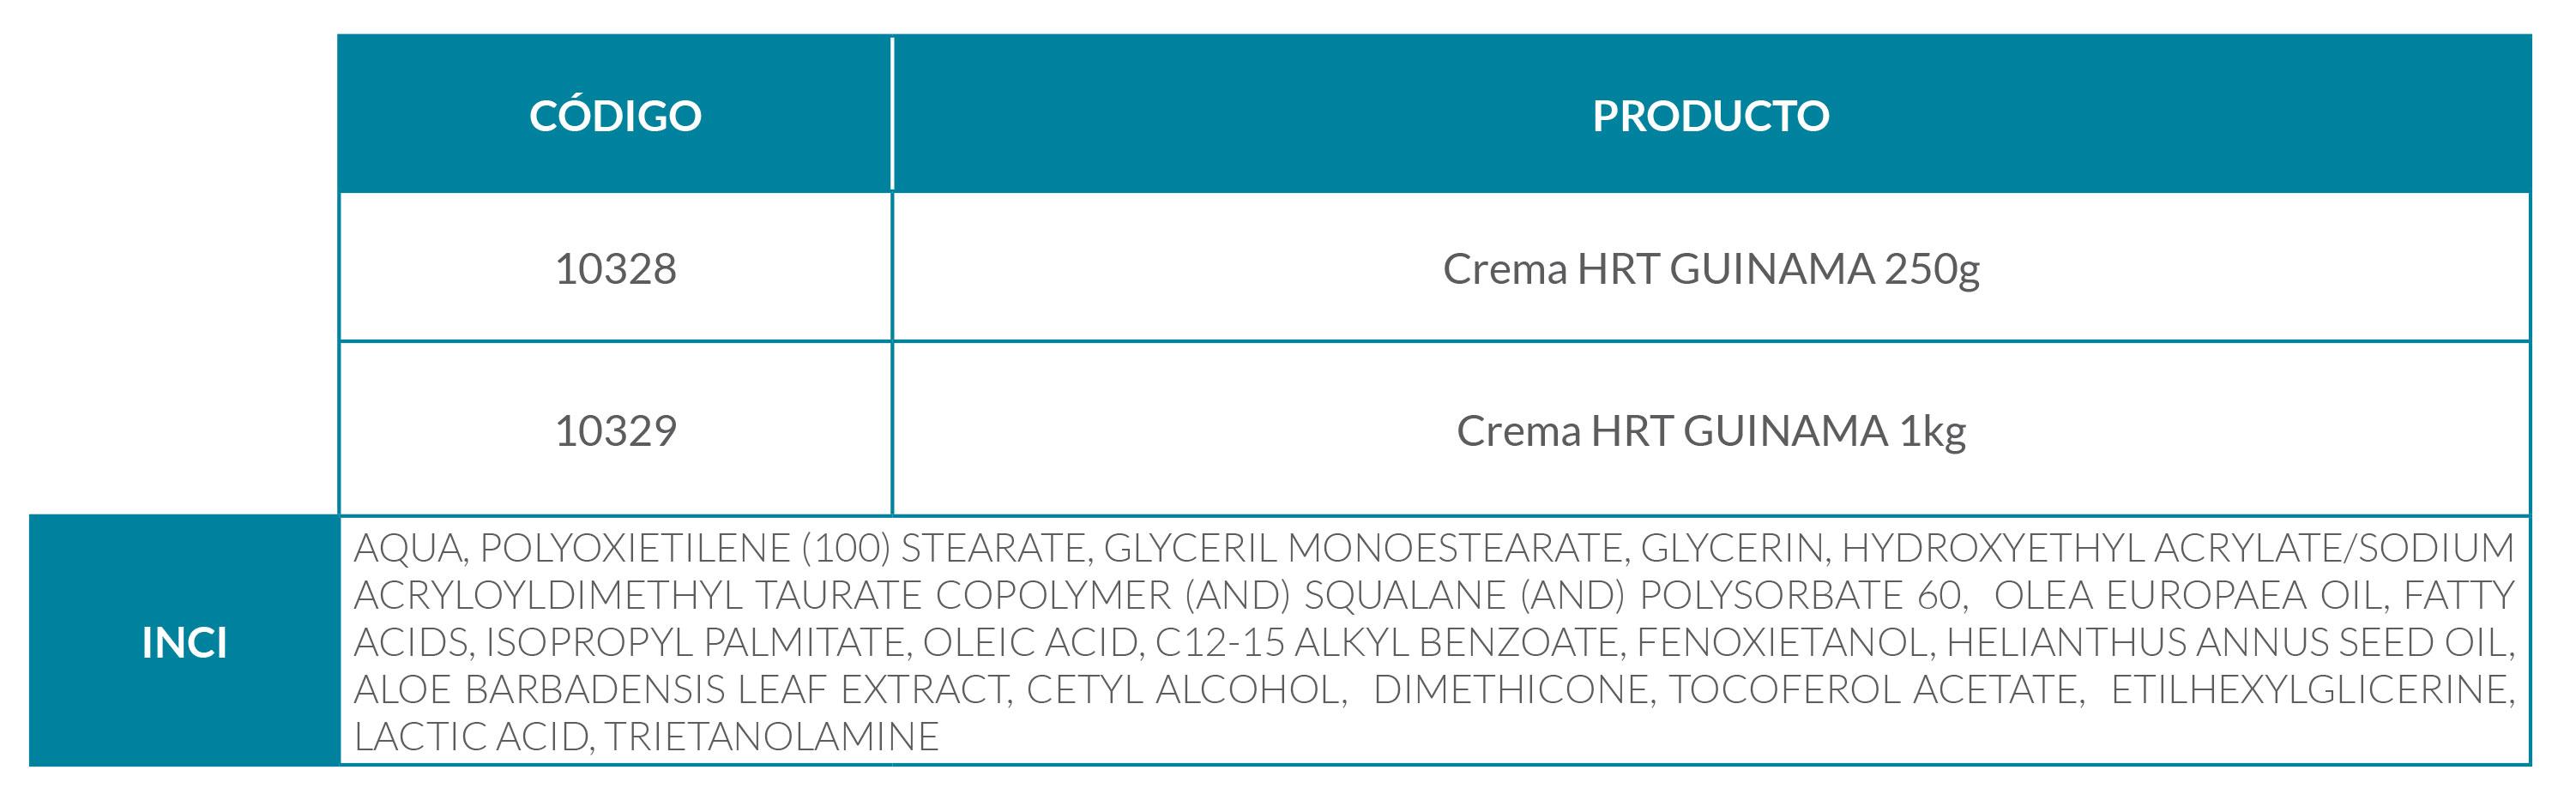 HRT crema específica Terapia Hormonal de Reemplazo